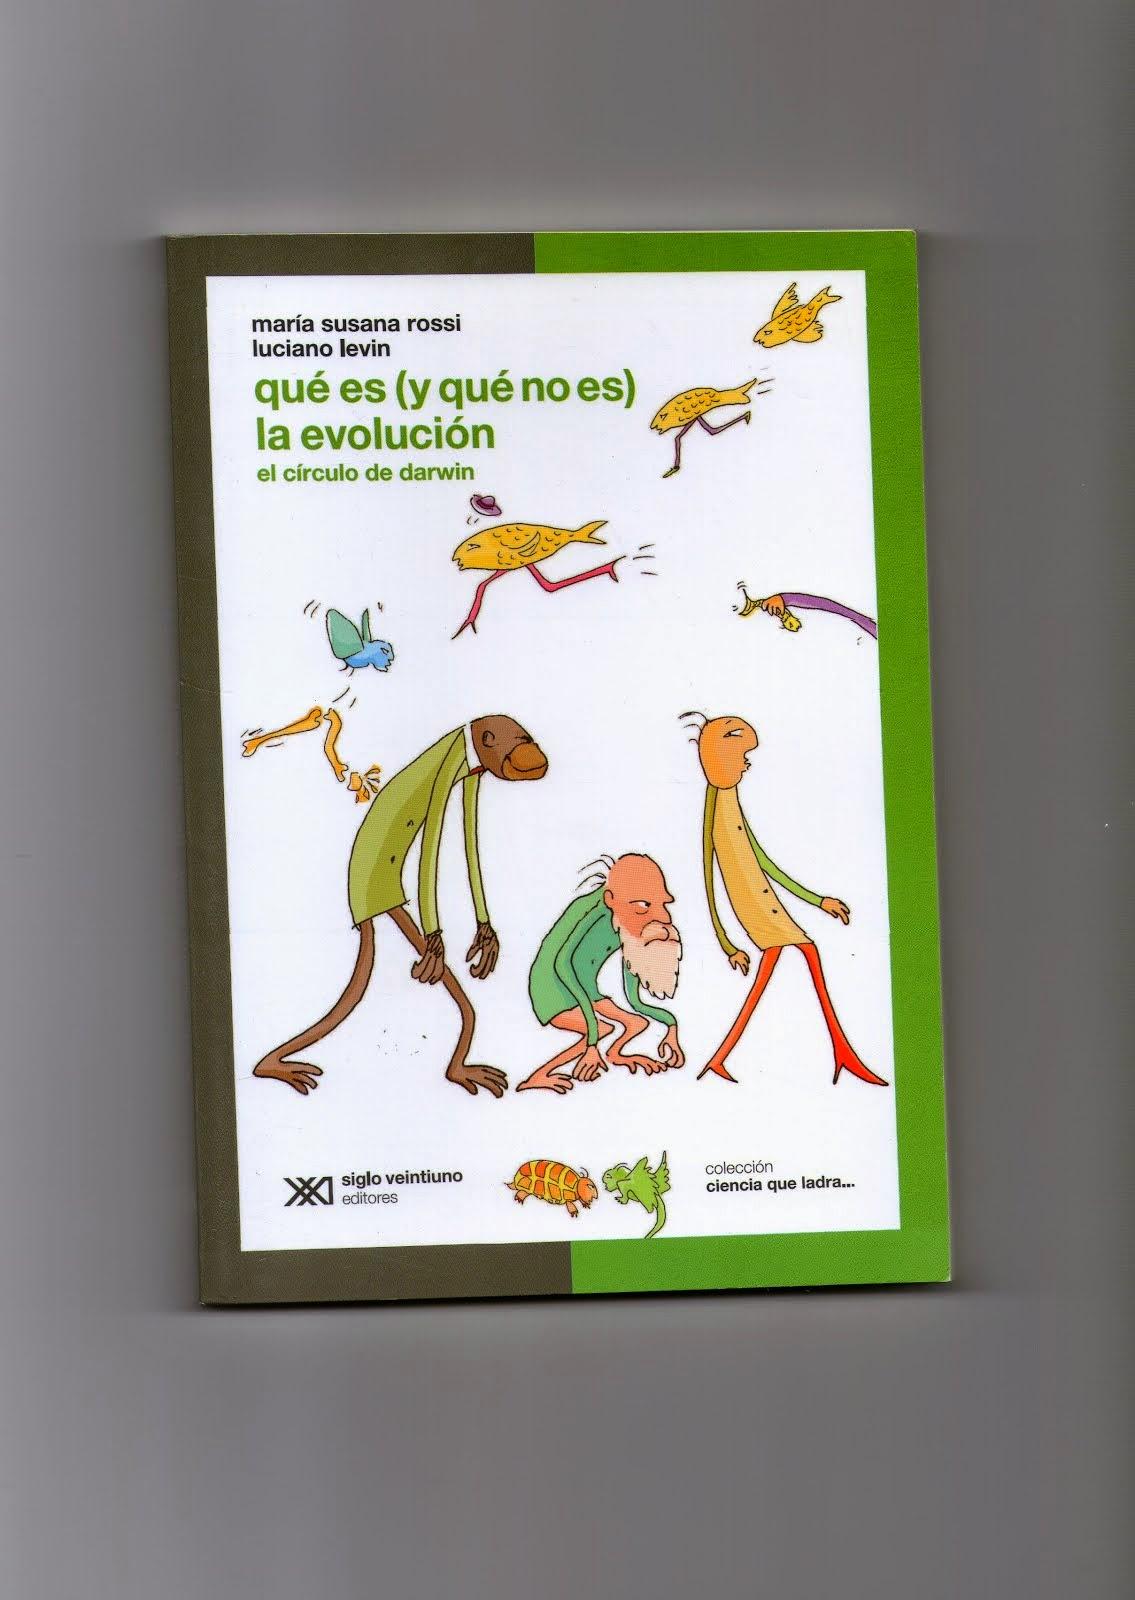 UN LIBRO  FACIL Y DIVERTIDO PARA ENTENDER EVOLUCION